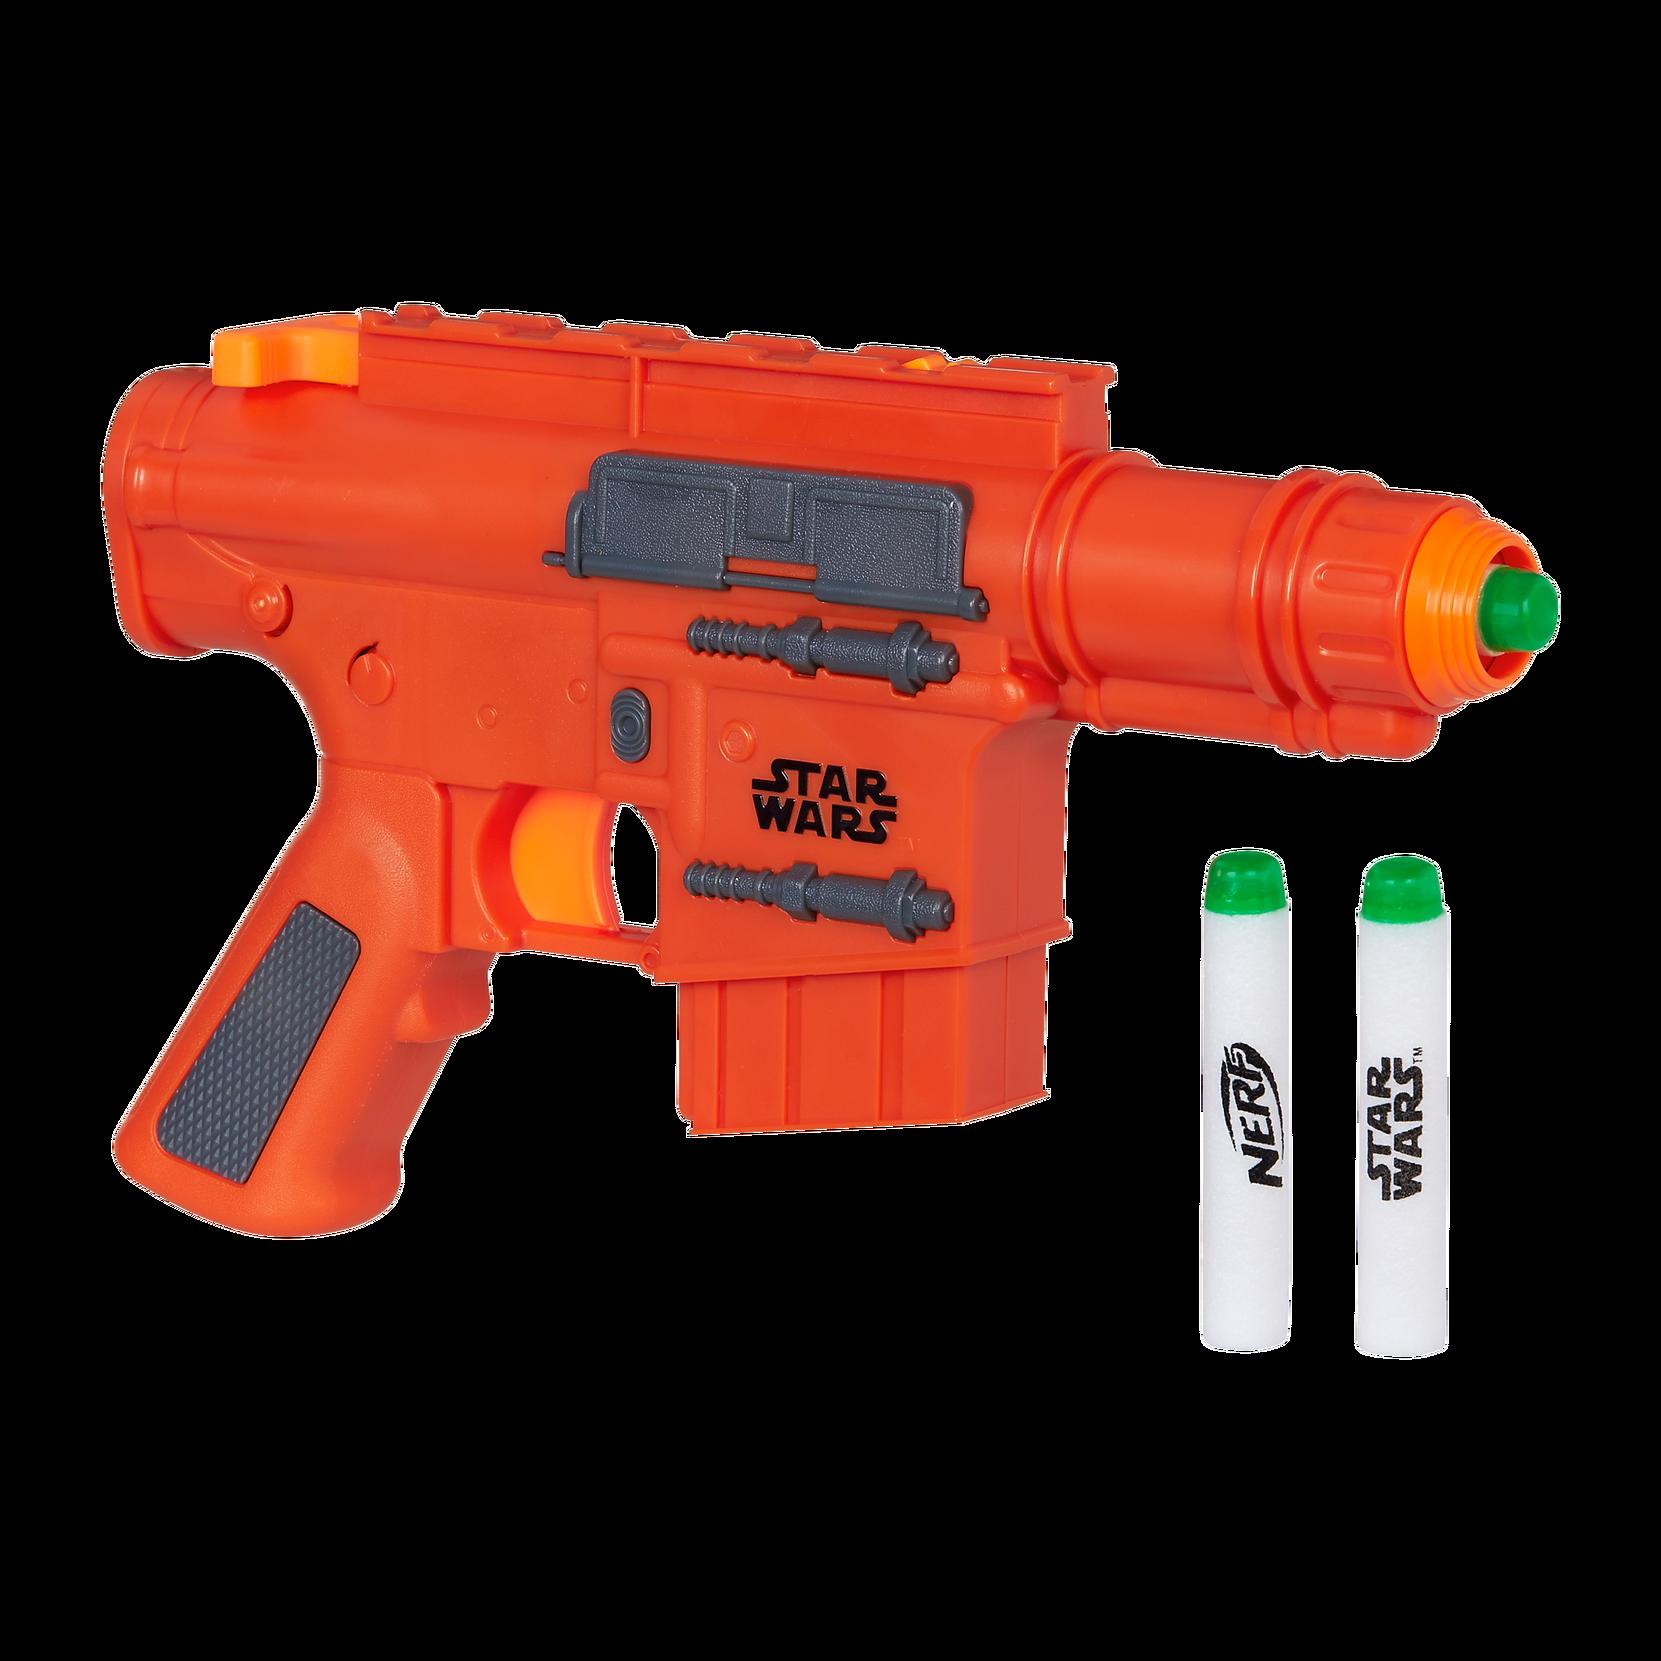 Star Wars Seal Communicator Green Blaster